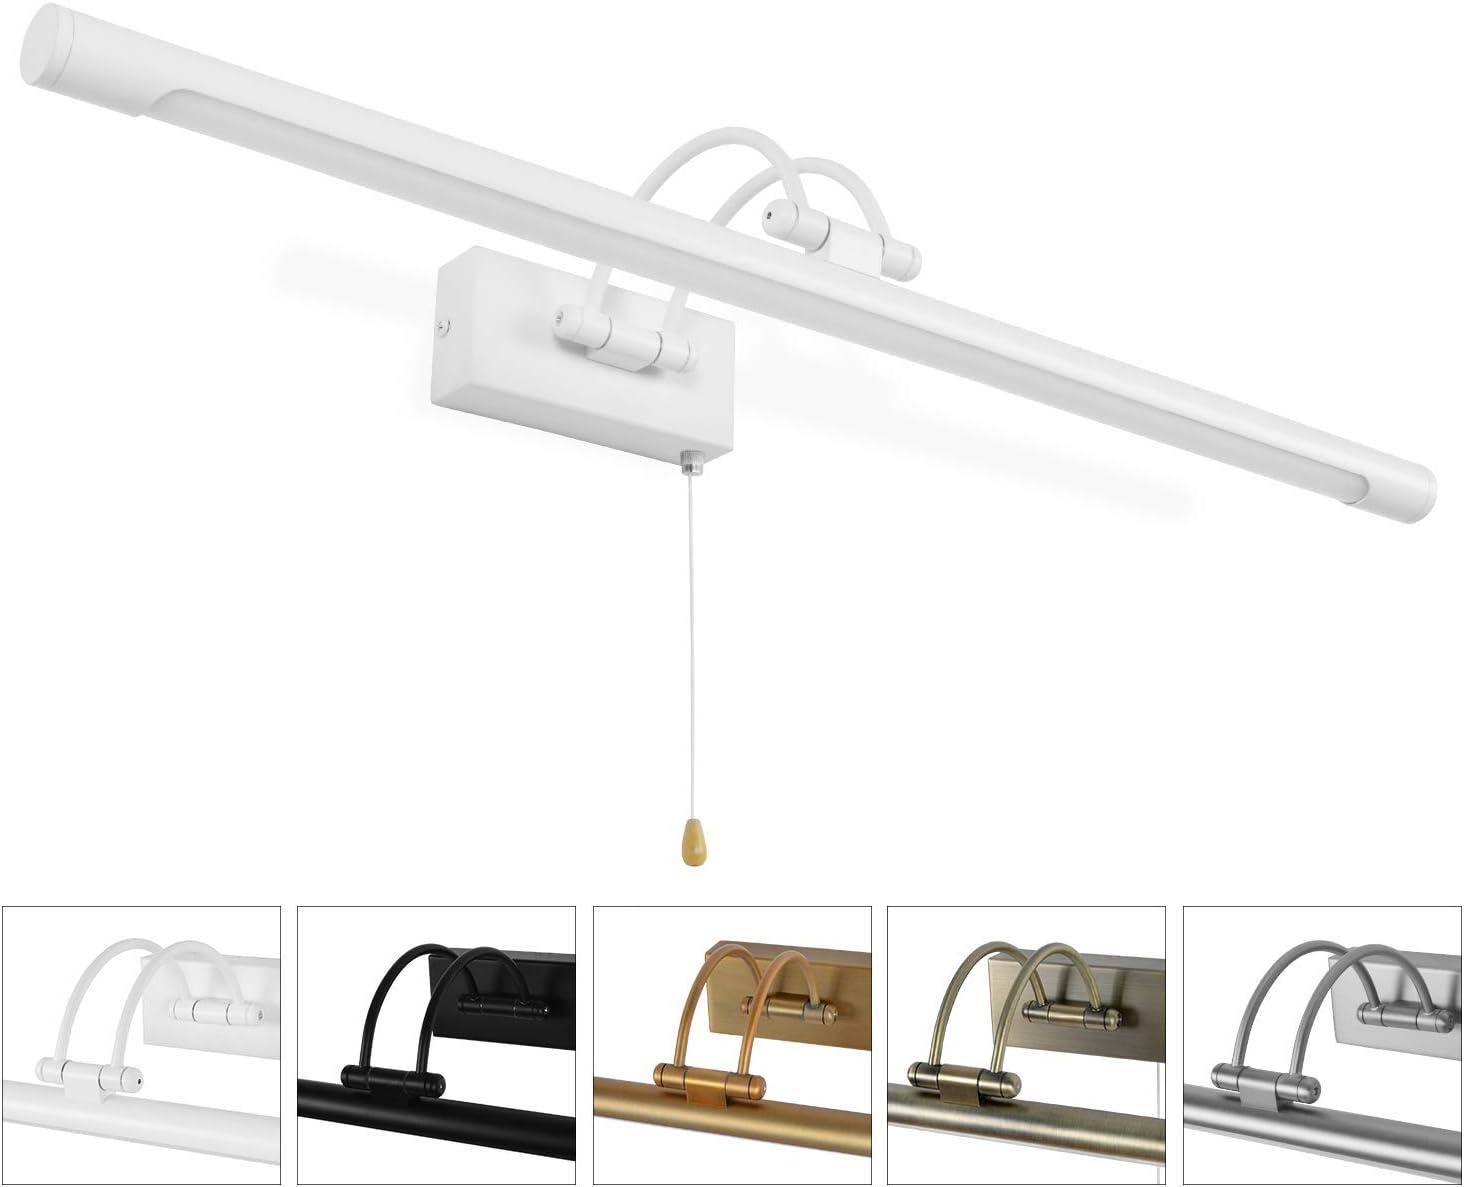 MantoLite LED Lámparas de Pared 12W,Dormitorio Iluminación de Interior Con Cabeza de Lámpara Giratoria e Interruptor,Baño Espejo Apliques de Pared 60CM 840LM Blanco Cálido (Blanco, 60CM)